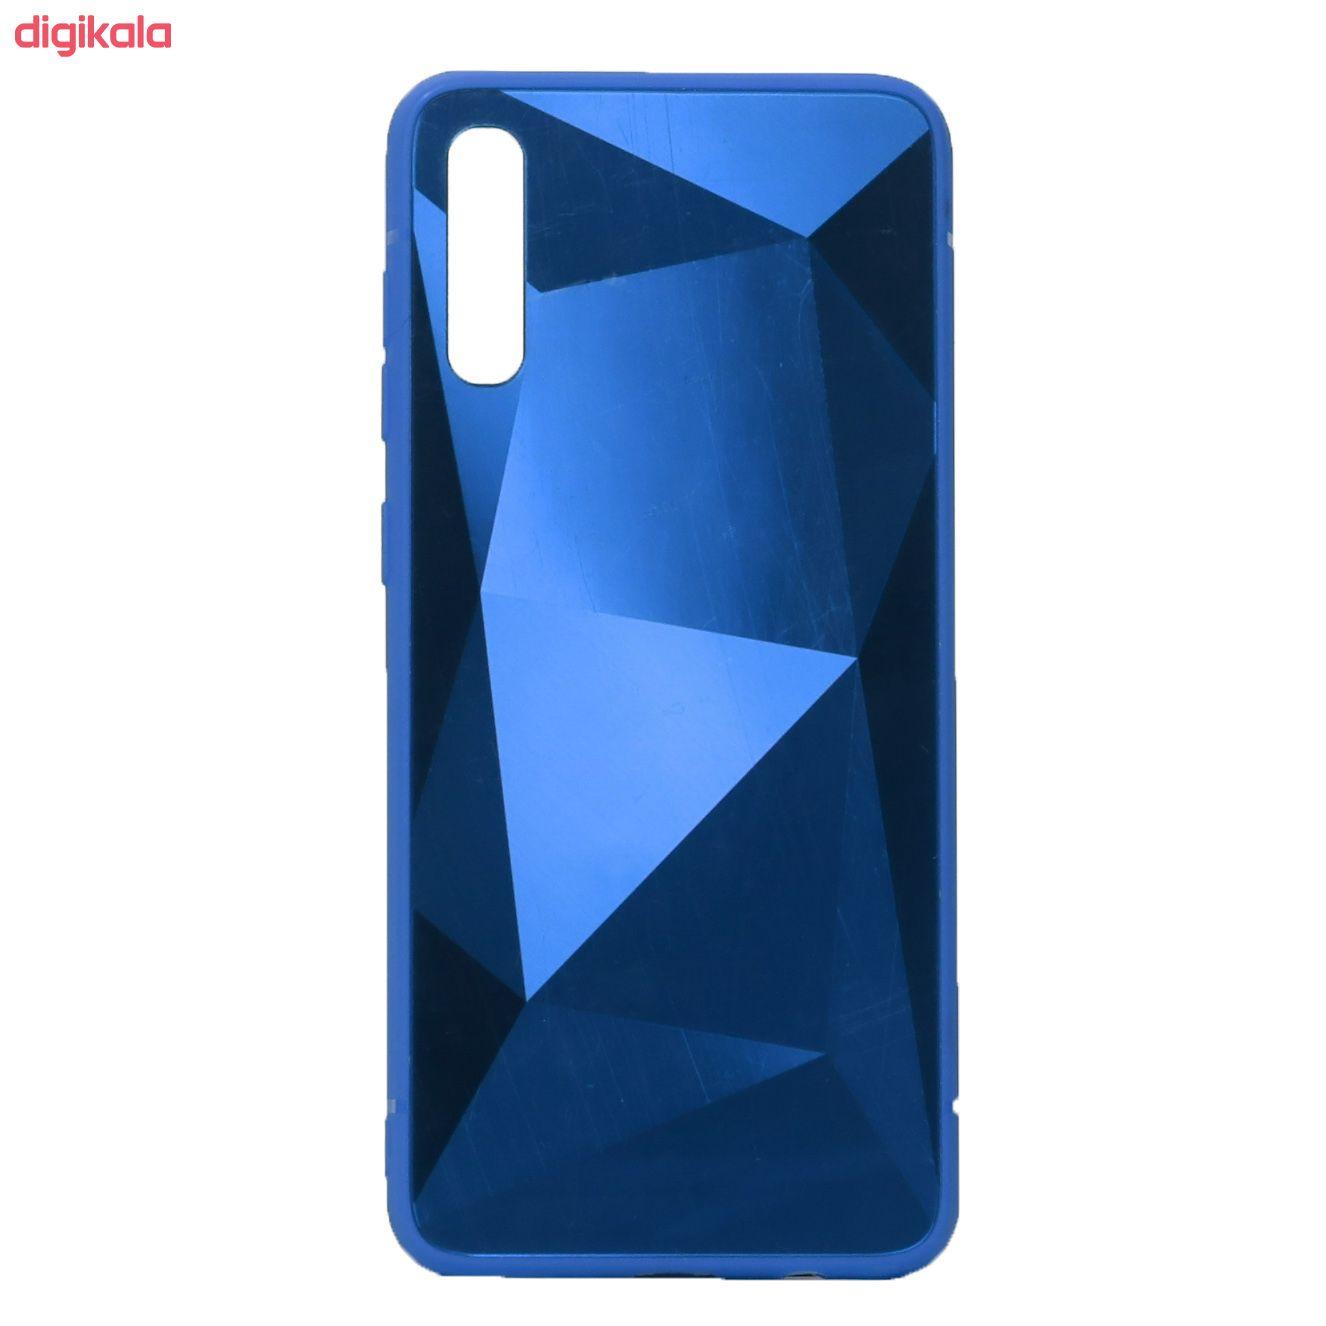 کاور طرح الماس مدل mr-506 مناسب برای گوشی موبایل سامسونگ Galaxy A50/A50s/a30s main 1 1